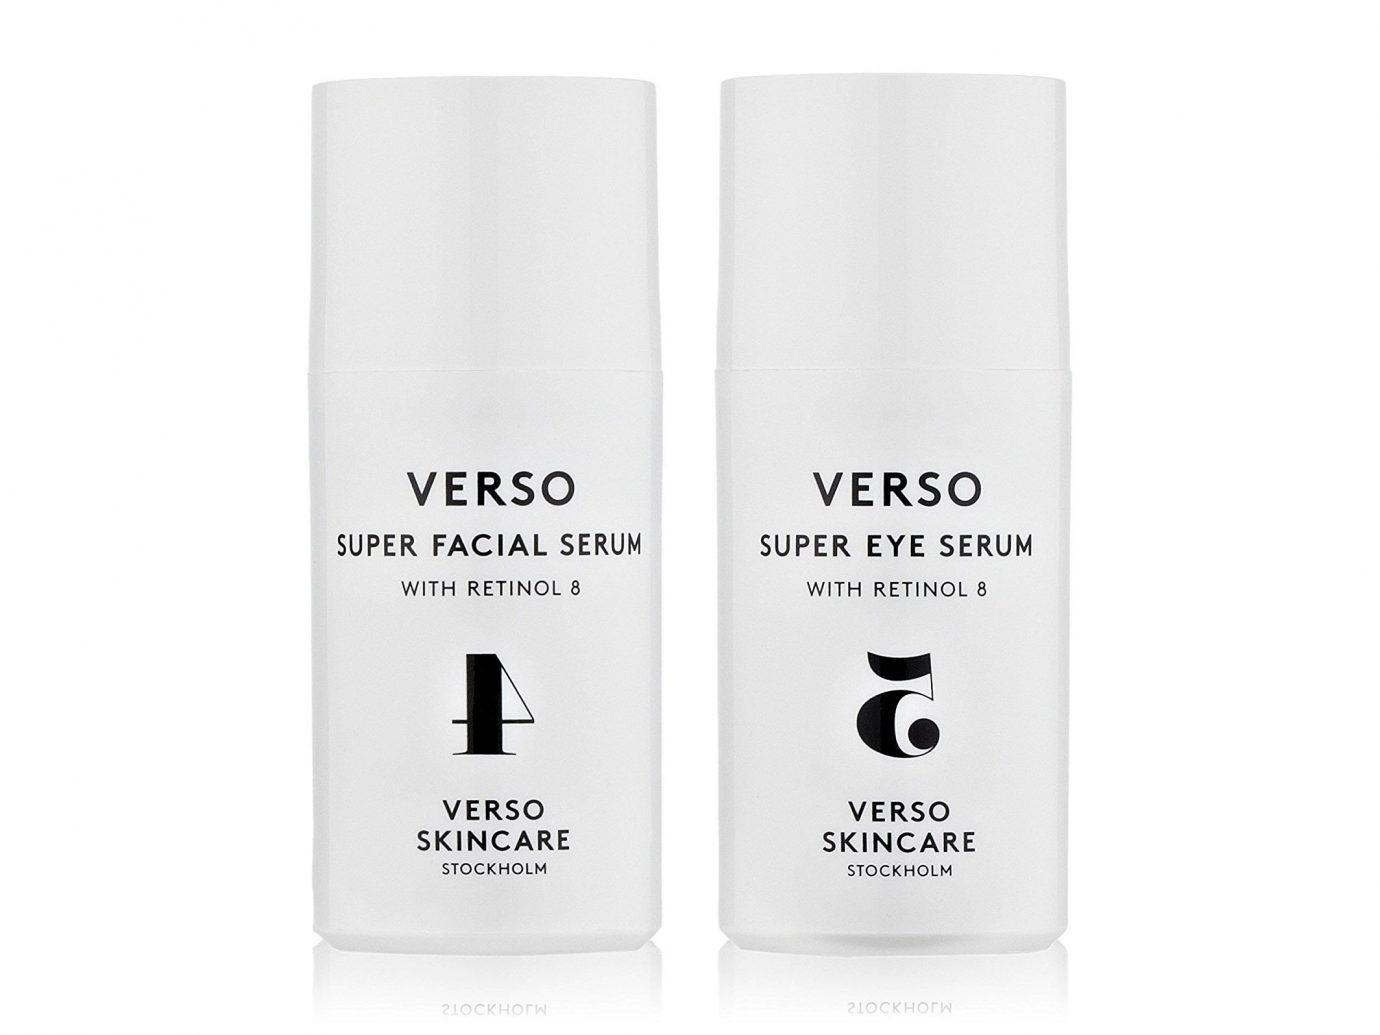 Beauty Travel Shop product skin care lotion health & beauty